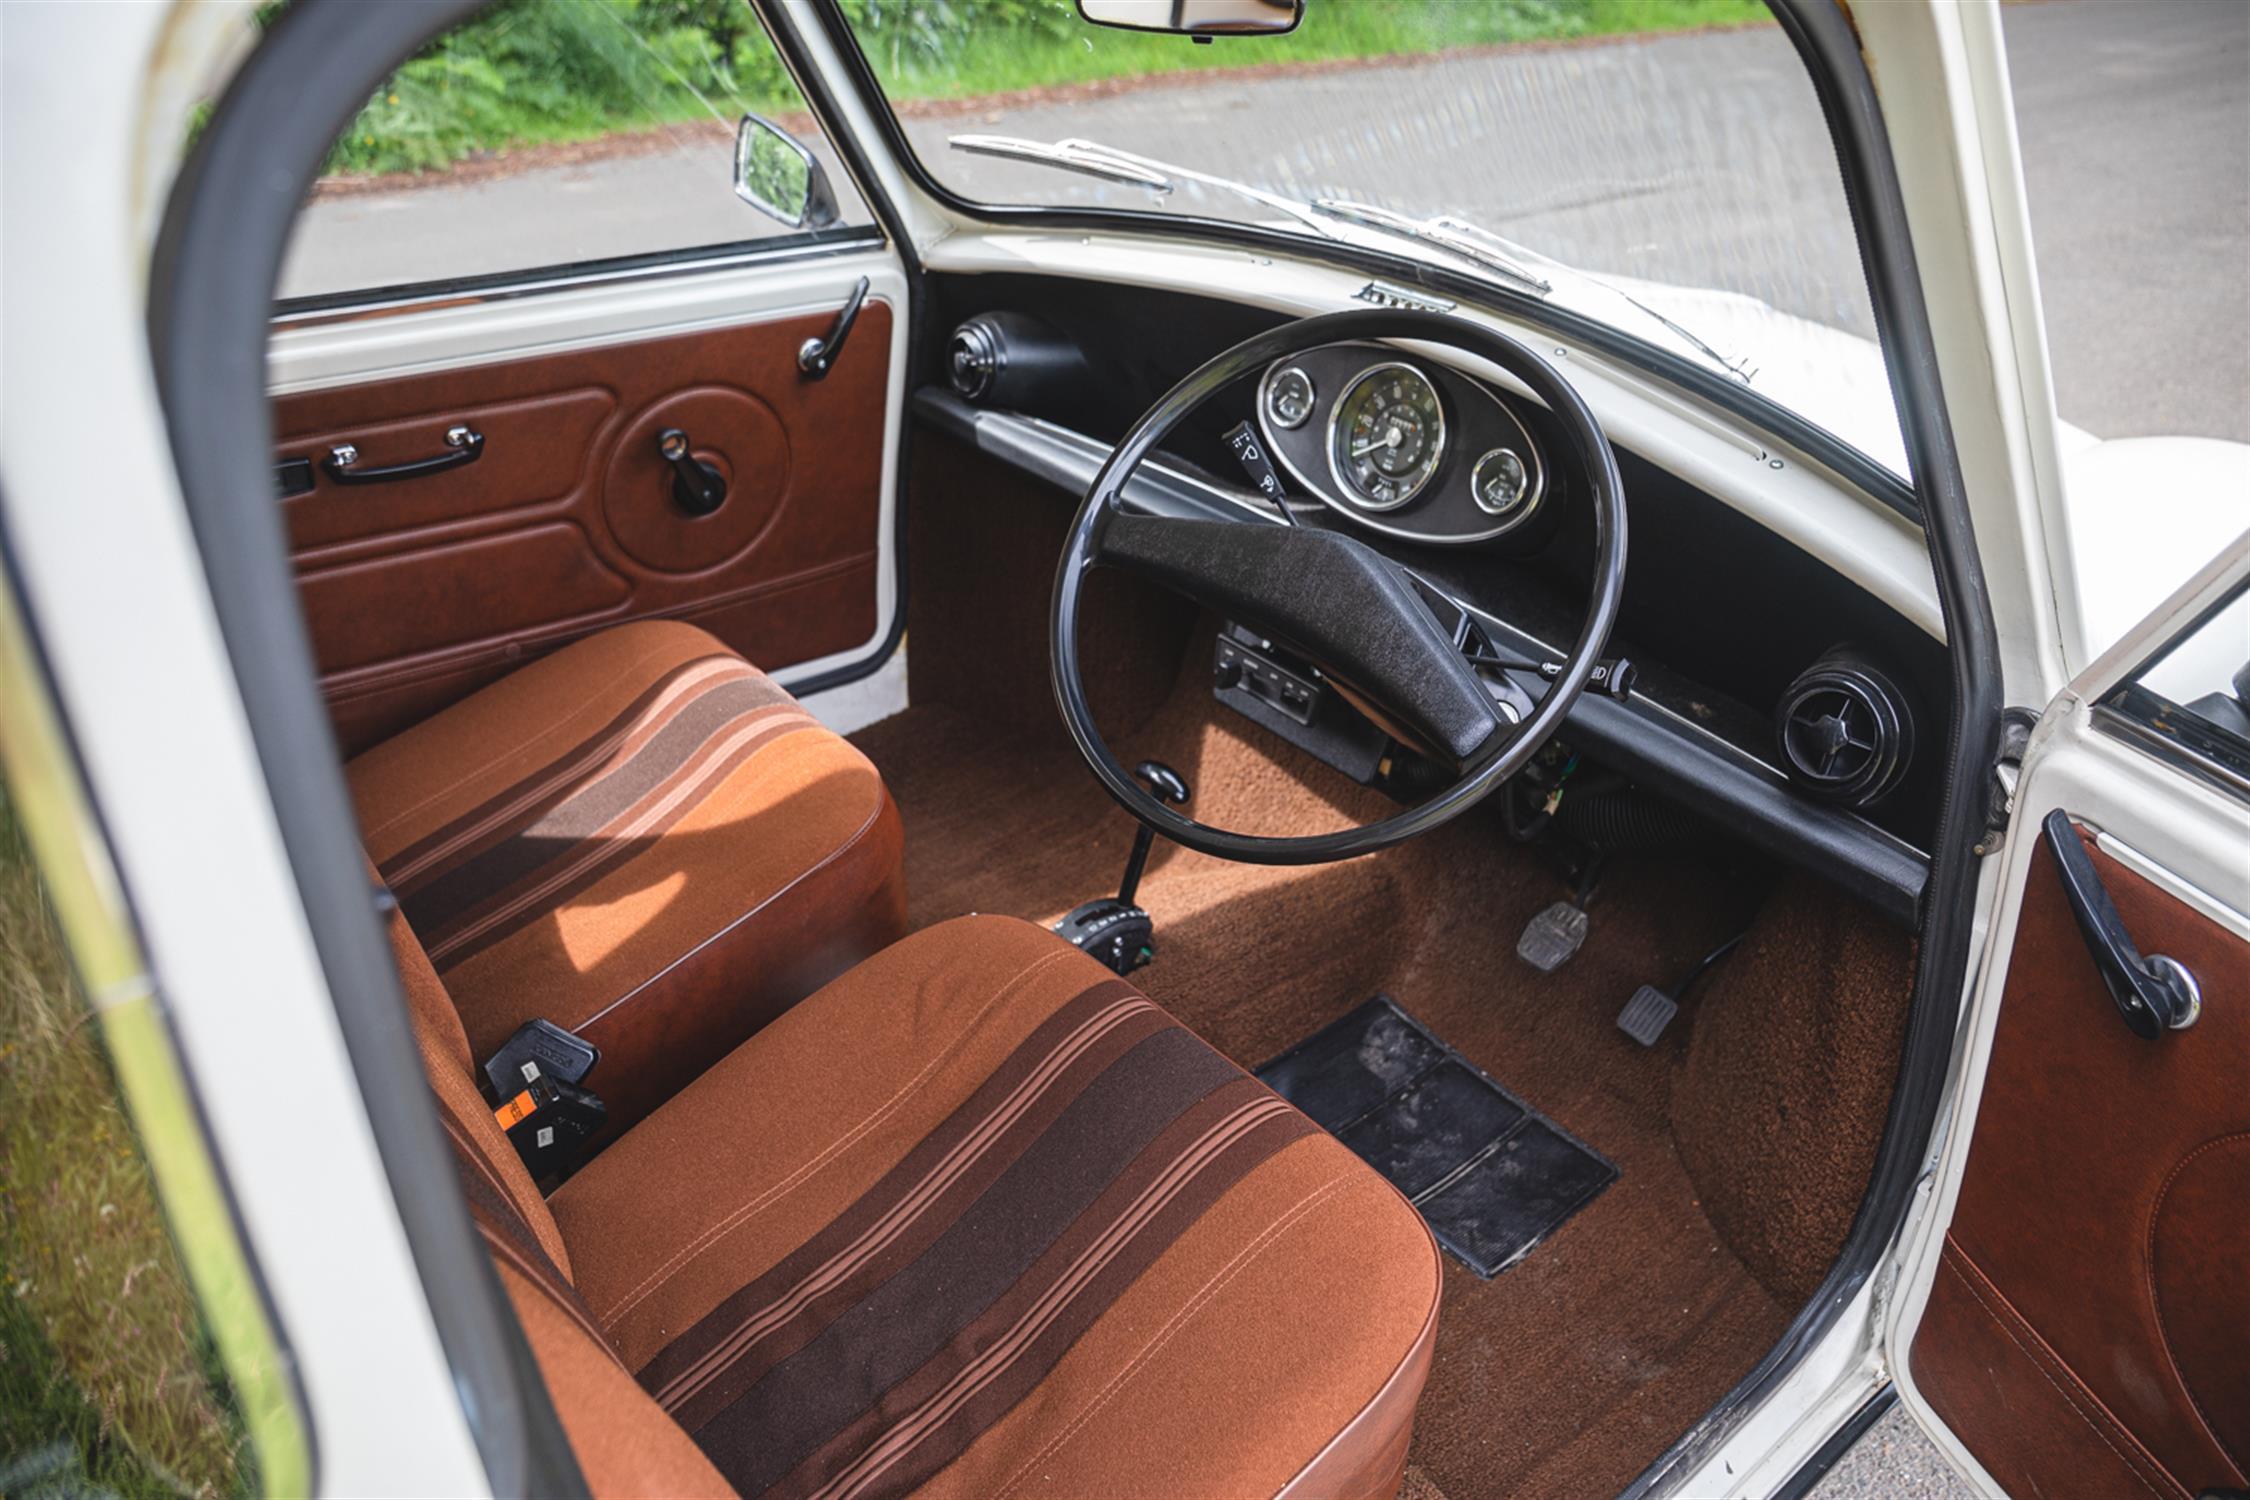 1979 Austin Mini 1000 (Auto) - 2,699 Miles - Image 3 of 10